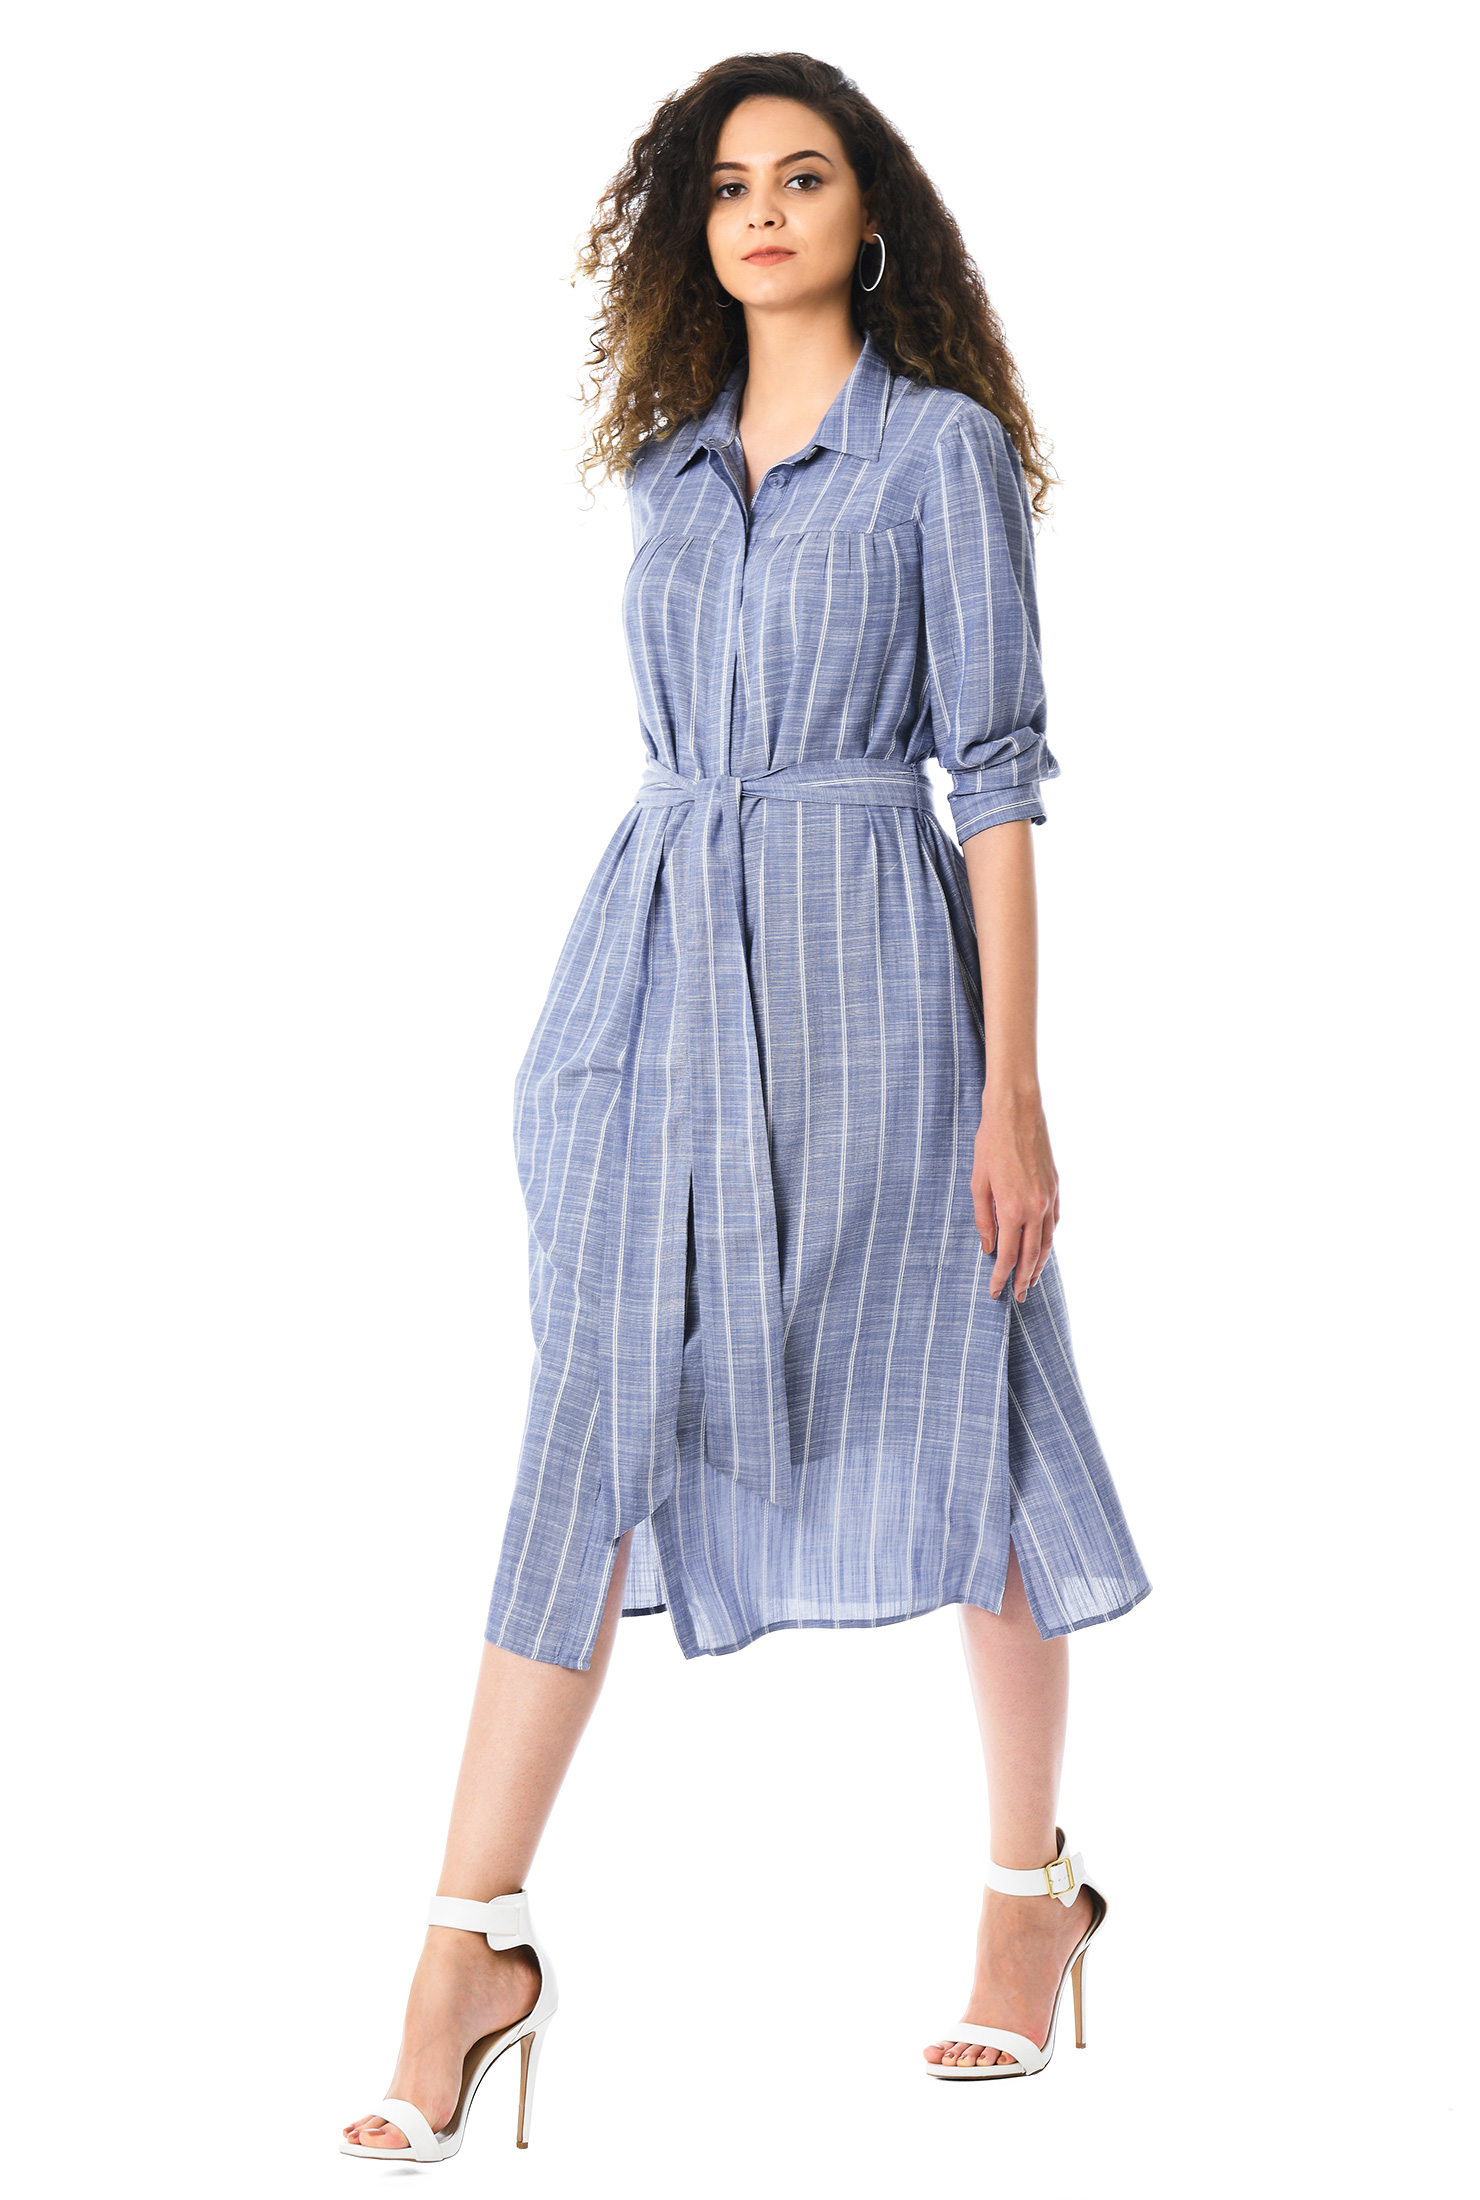 5fa9580925 Women s Fashion Clothing 0-36W and Custom